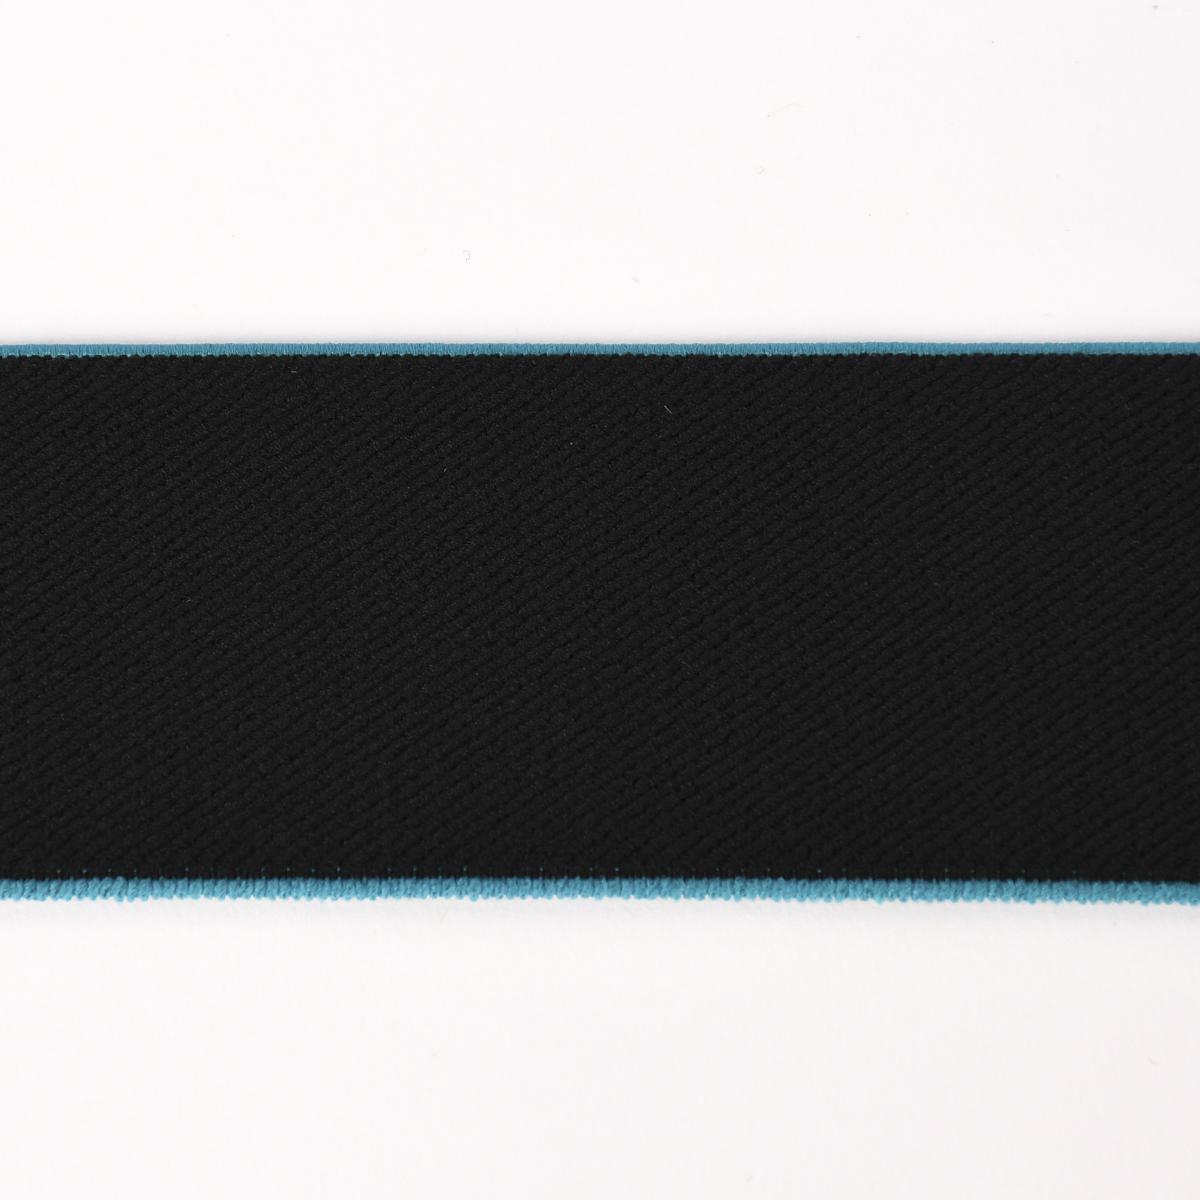 Gummiband mit farbigem Rand schwarz petrol Breite: 4cm